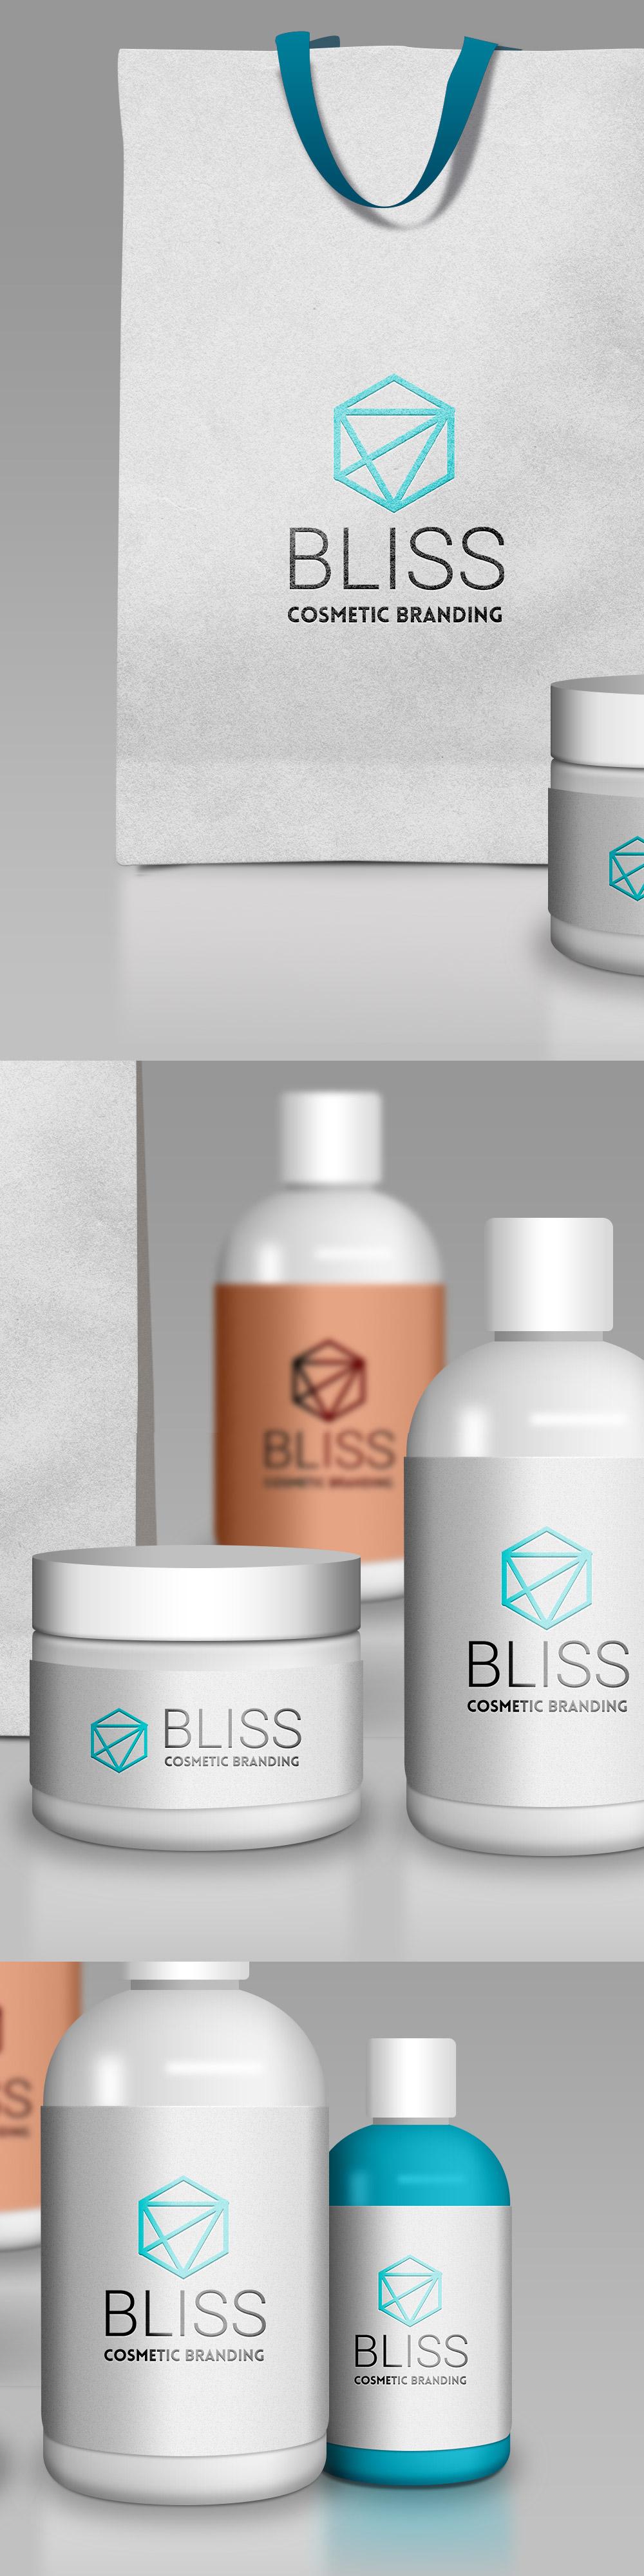 Cosmetic Branding PSD MockUp Template - Responsive Joomla and ...